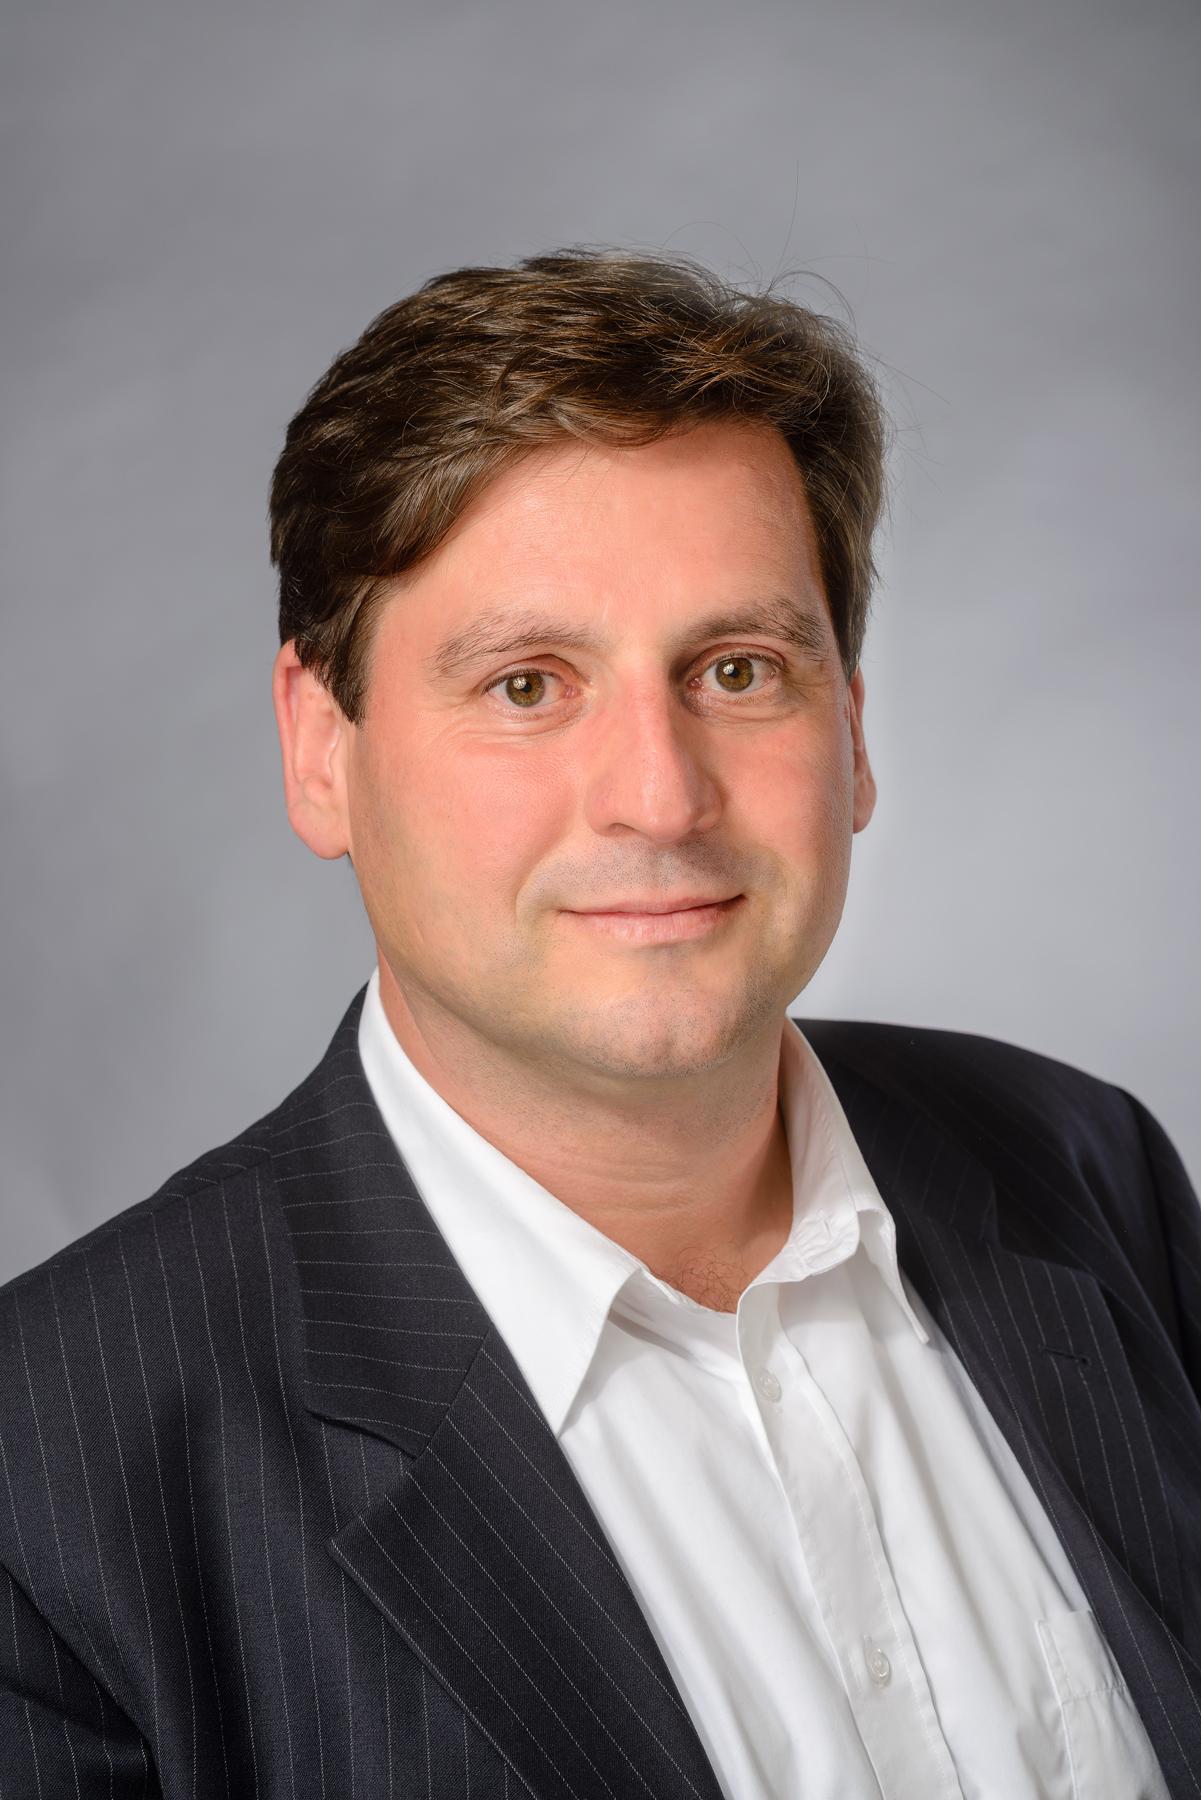 Kurt Staska